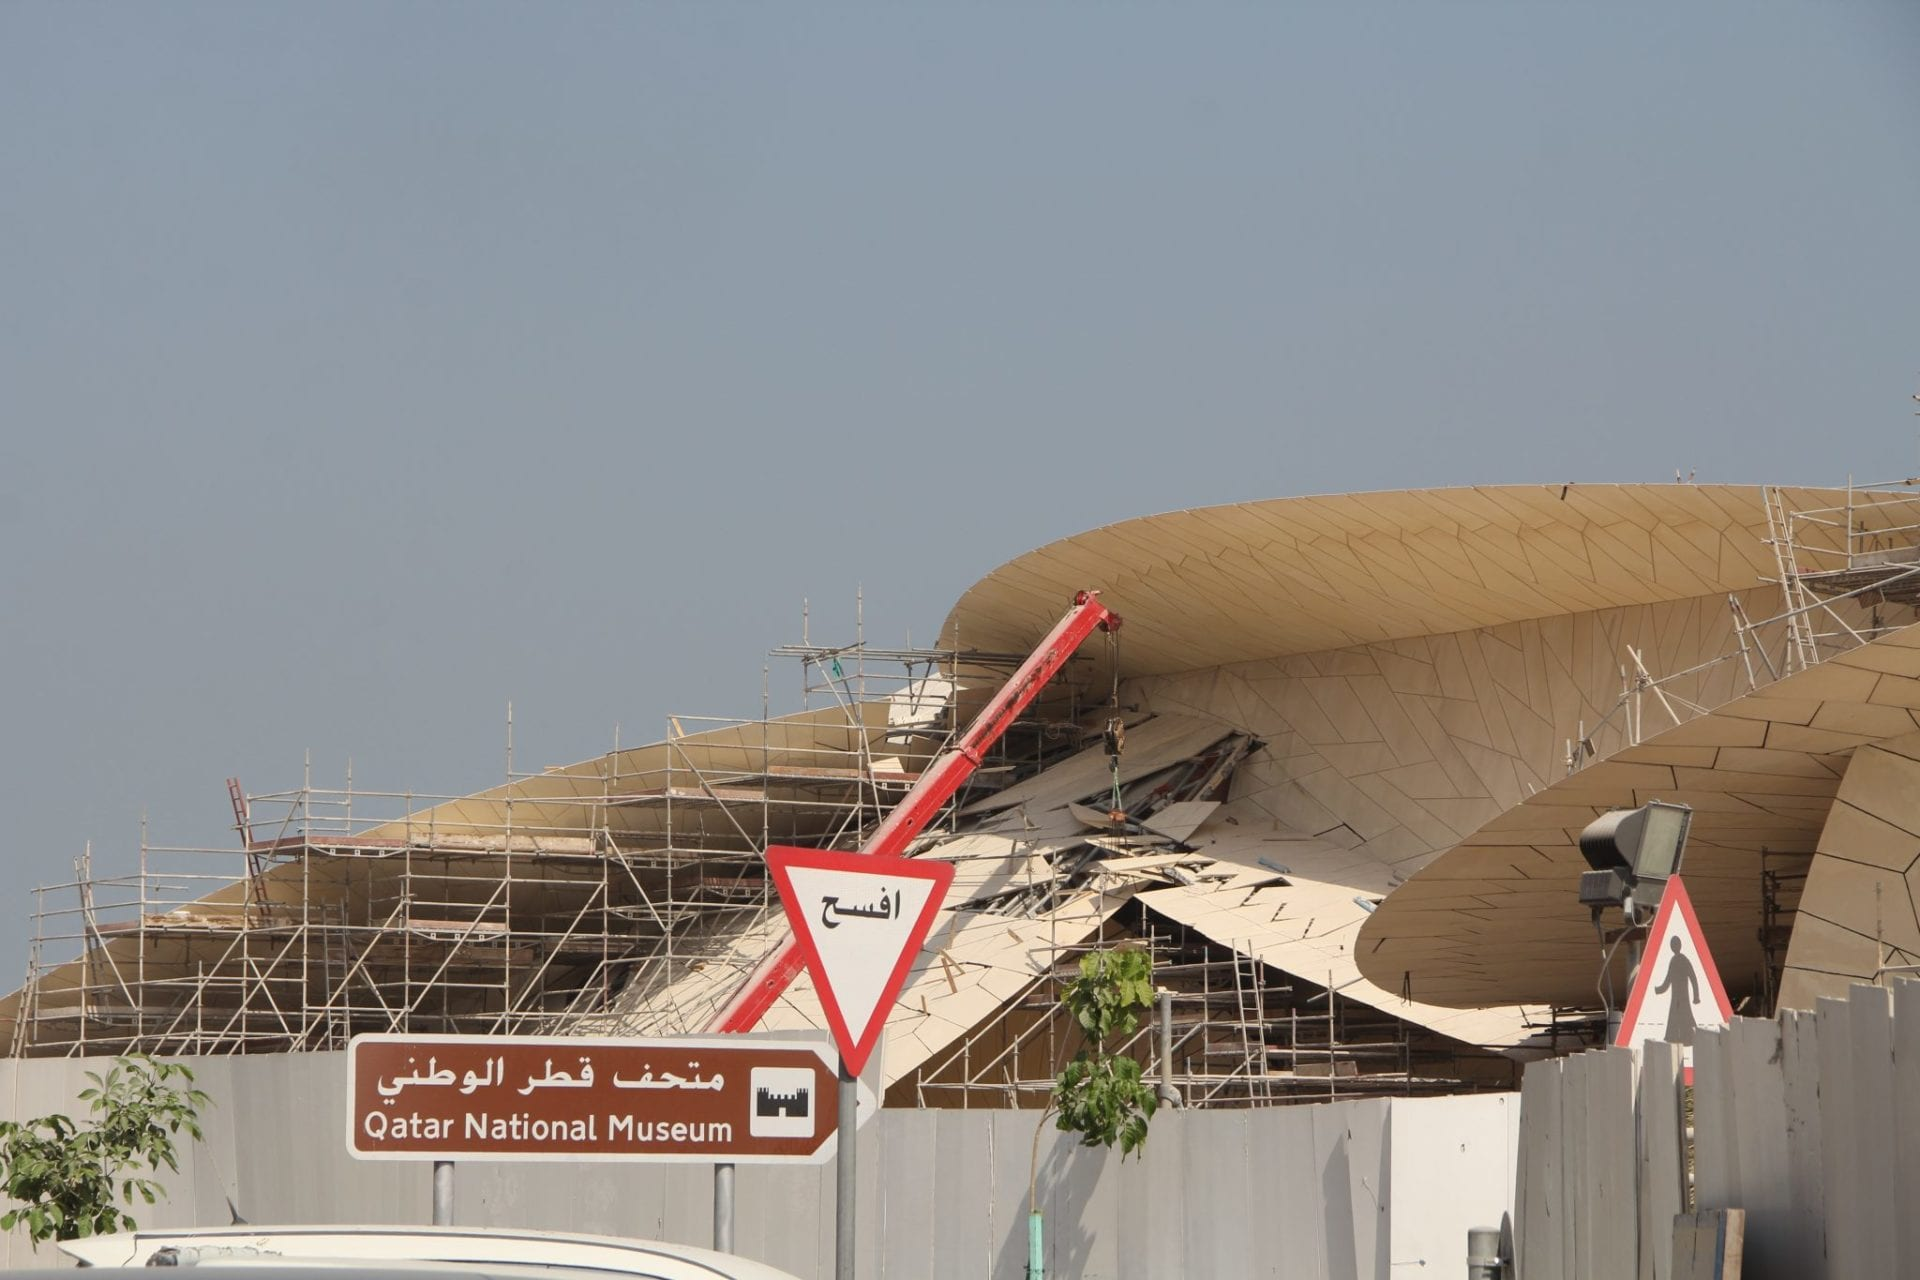 Qatar National Museum Doha